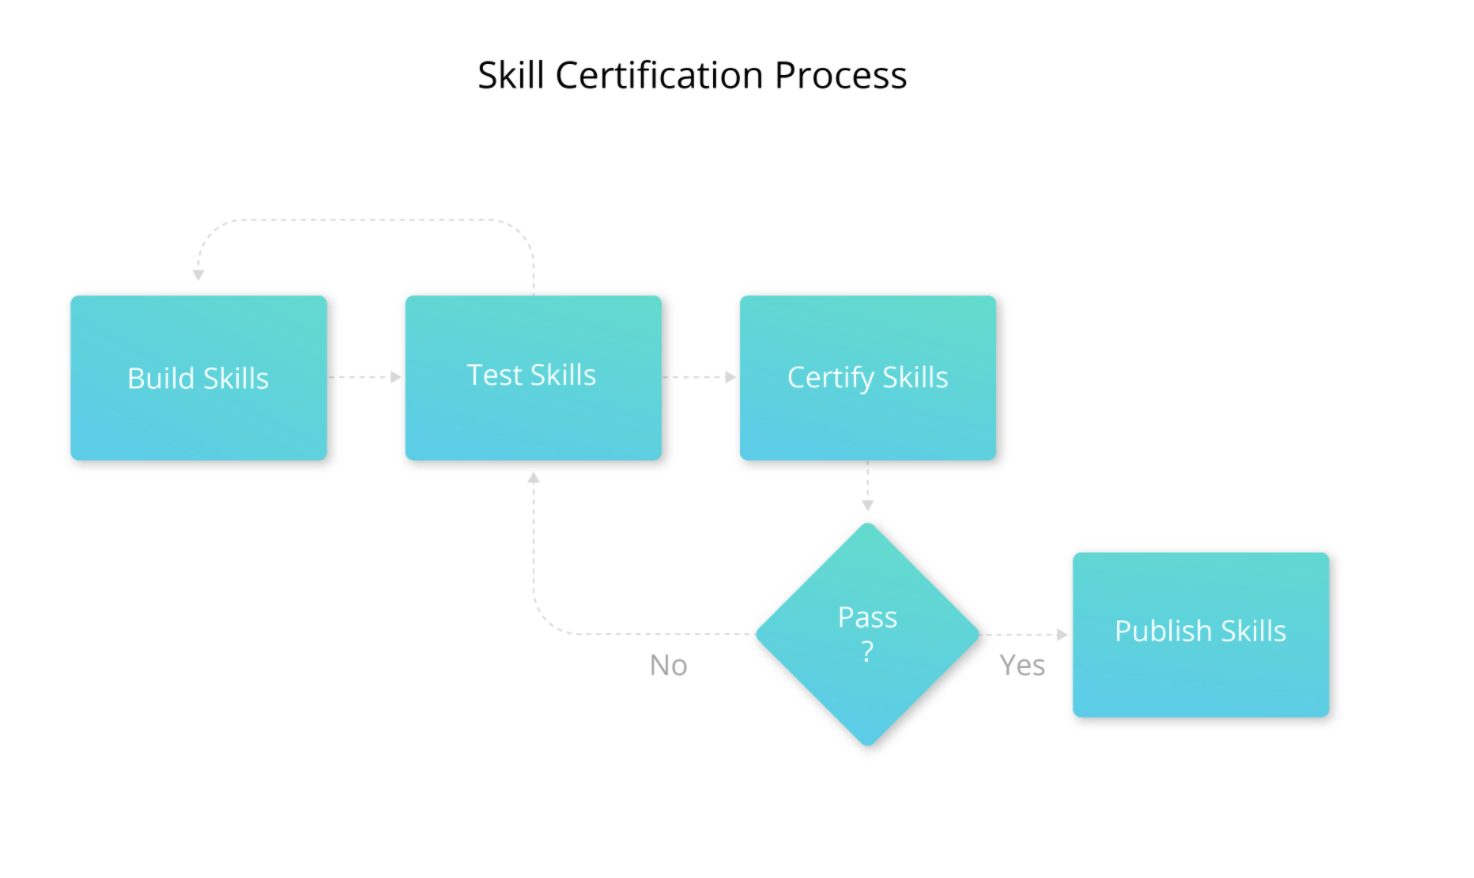 Alexa - Skill Certification Process - mytechmint